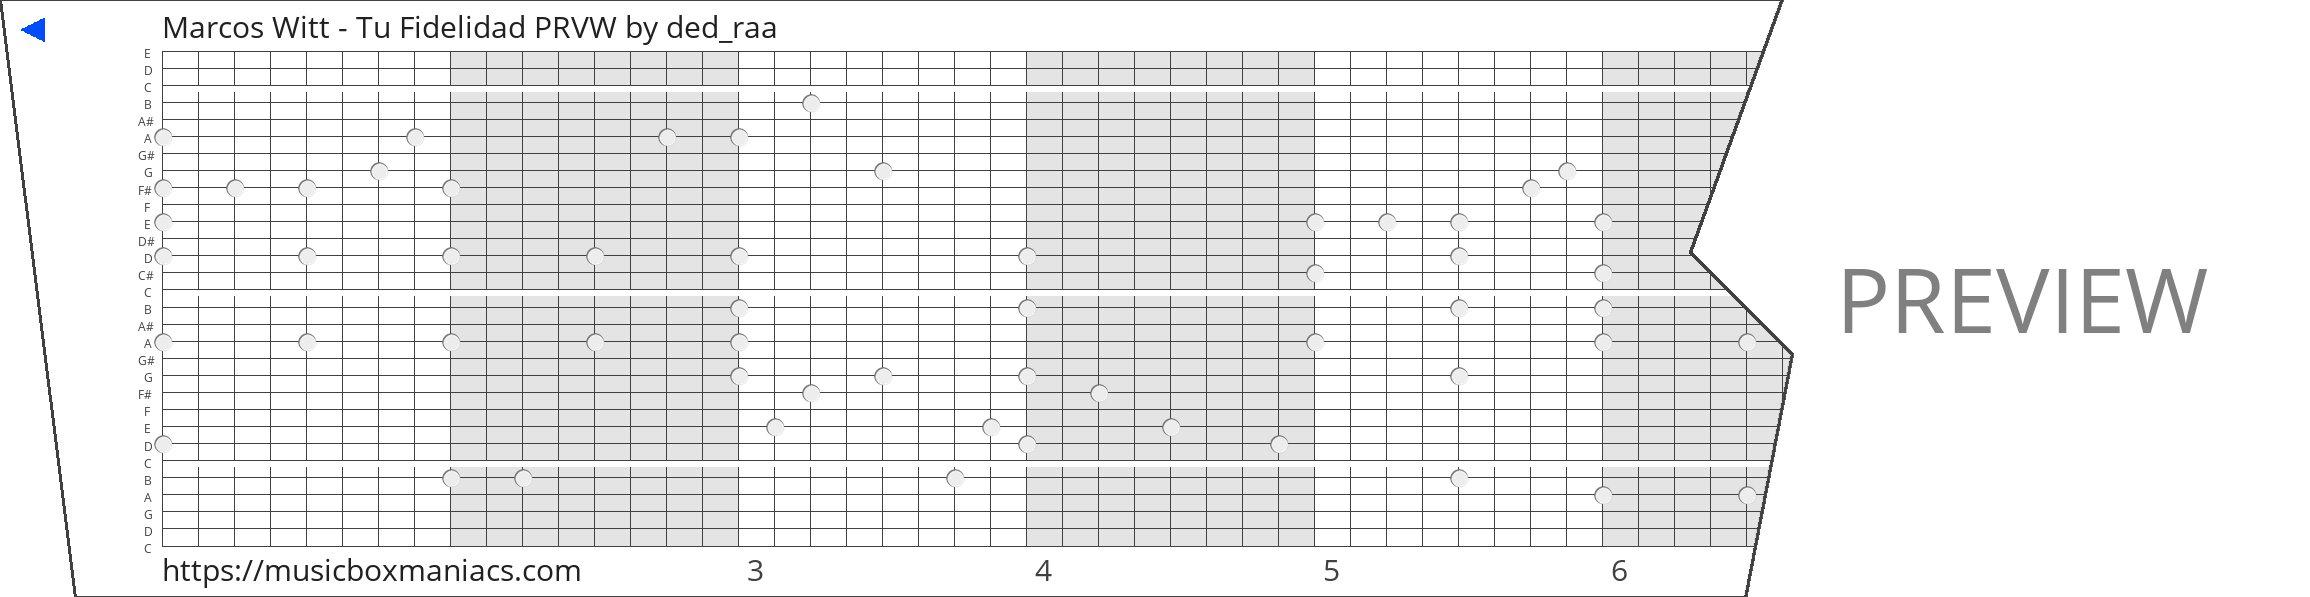 Marcos Witt - Tu Fidelidad PRVW 30 note music box paper strip